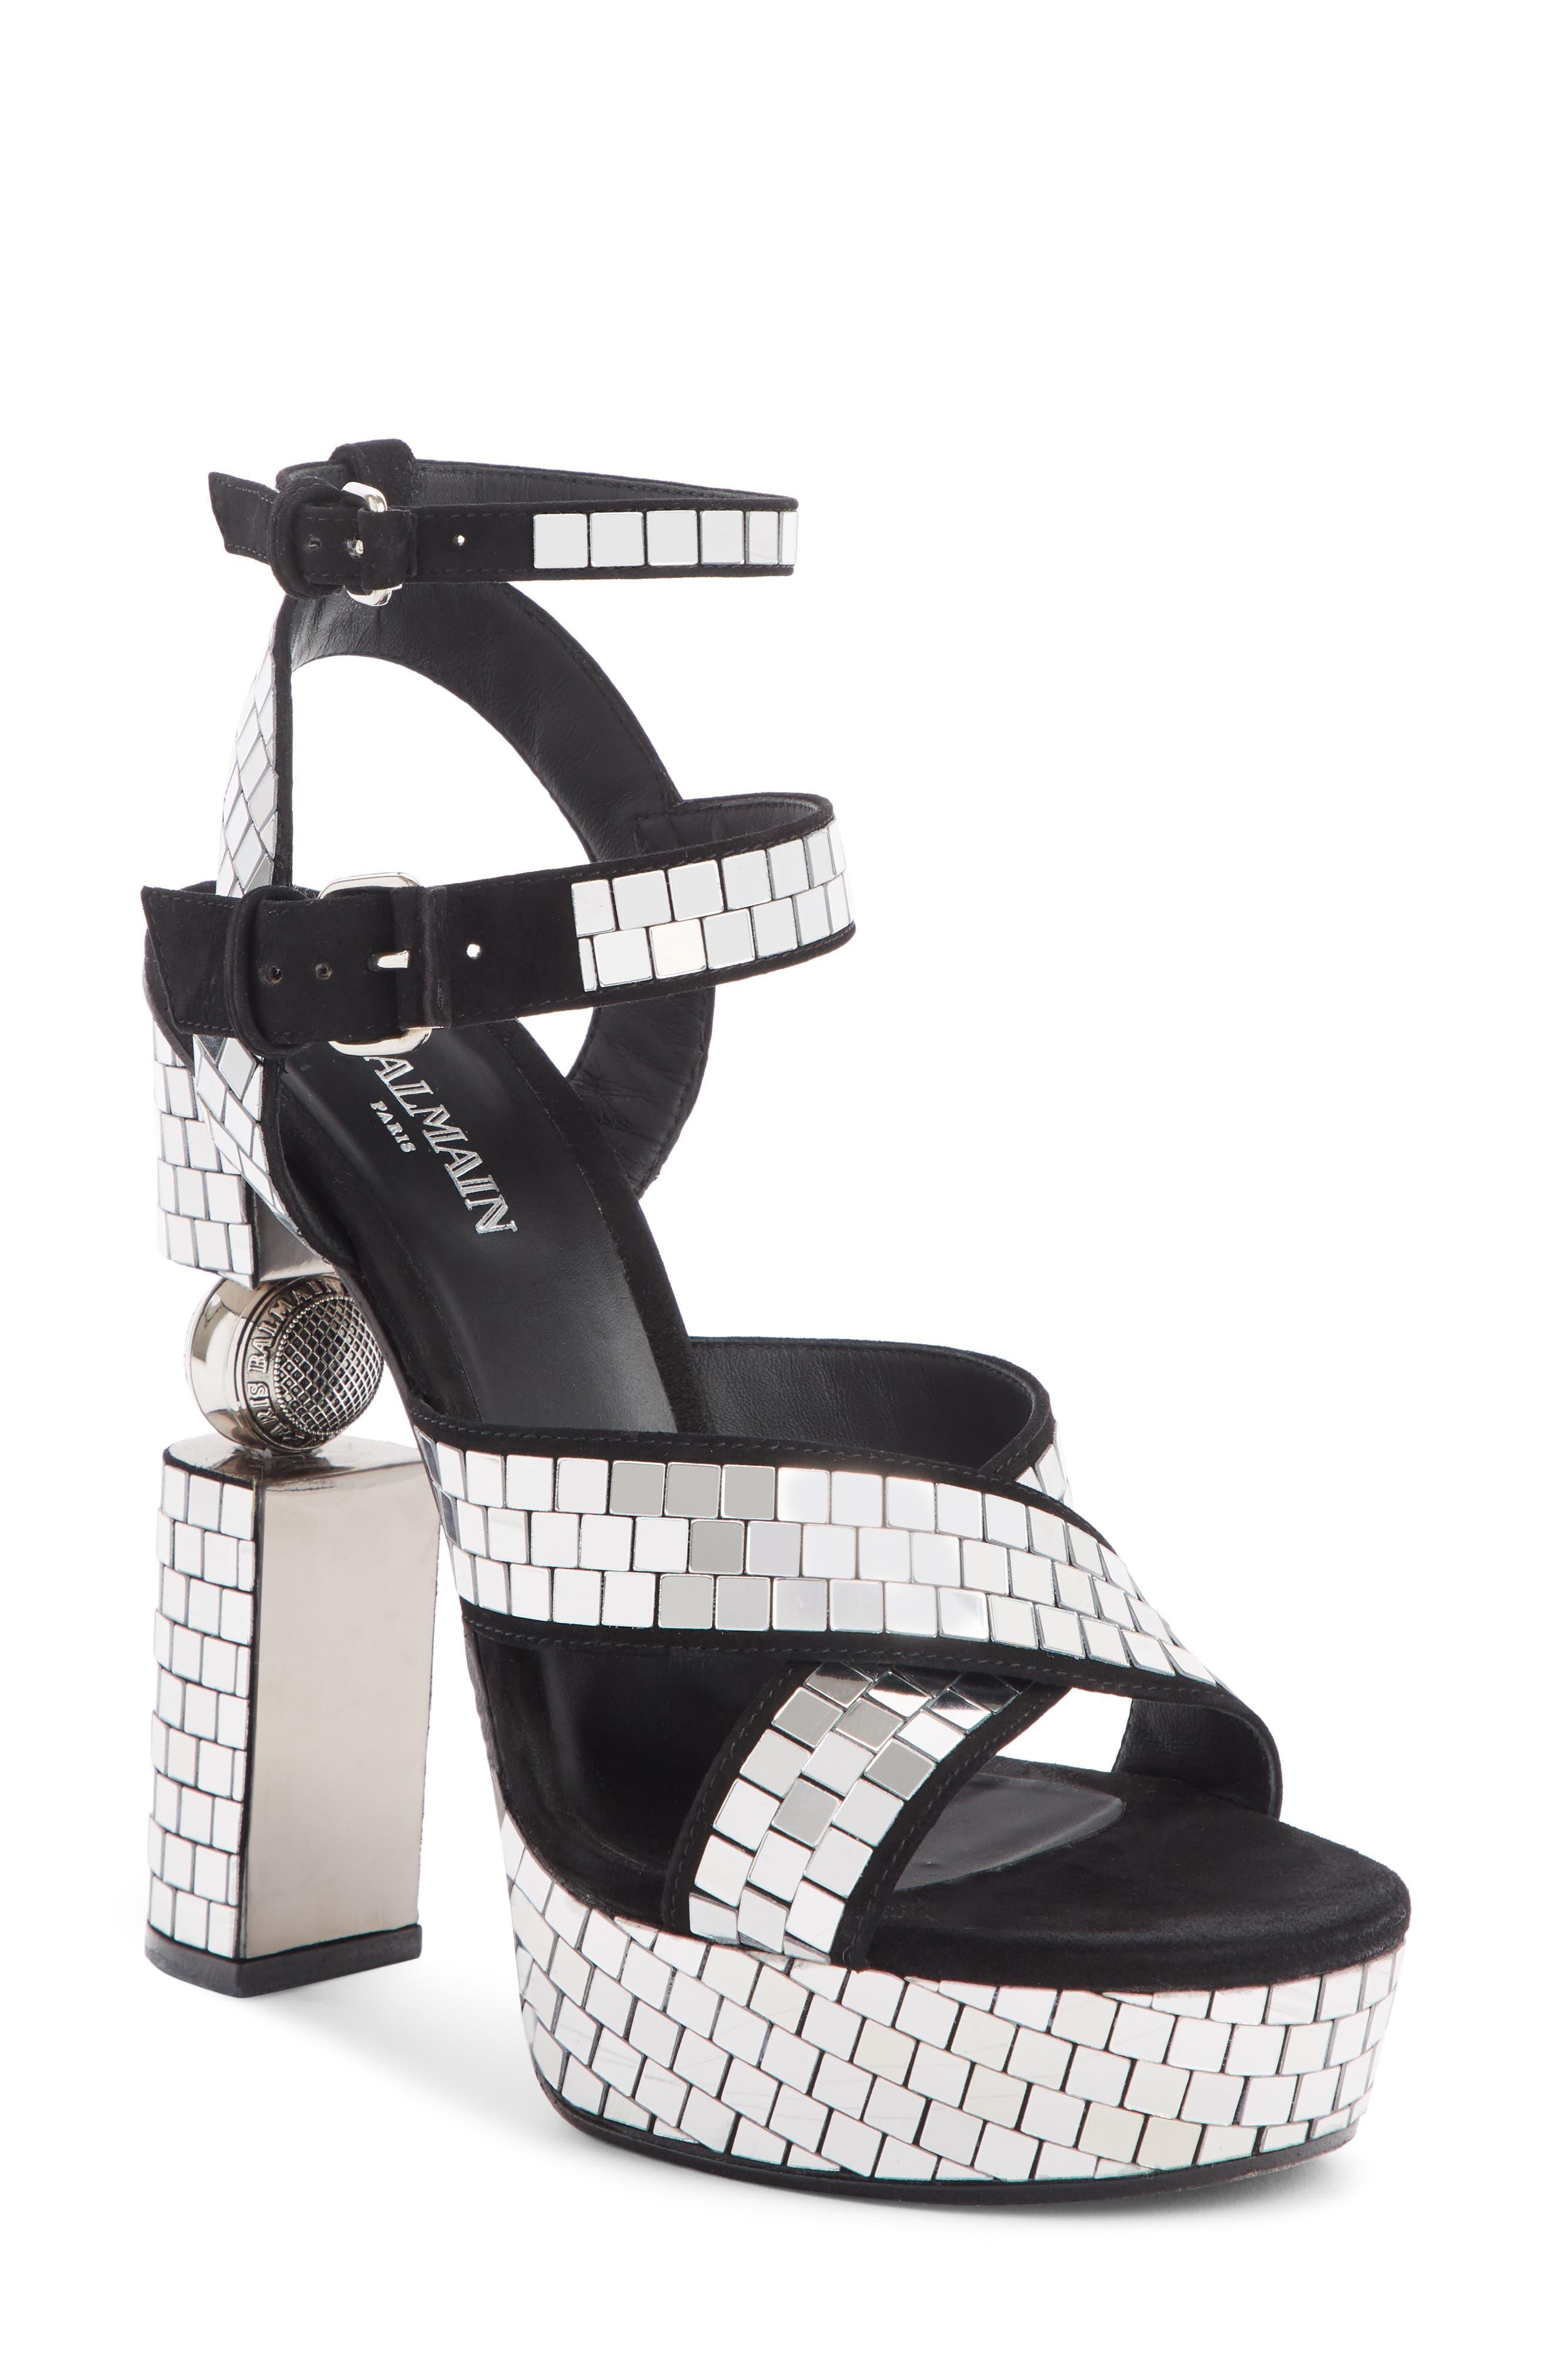 eb448356a867 Women s Balmain Sandals